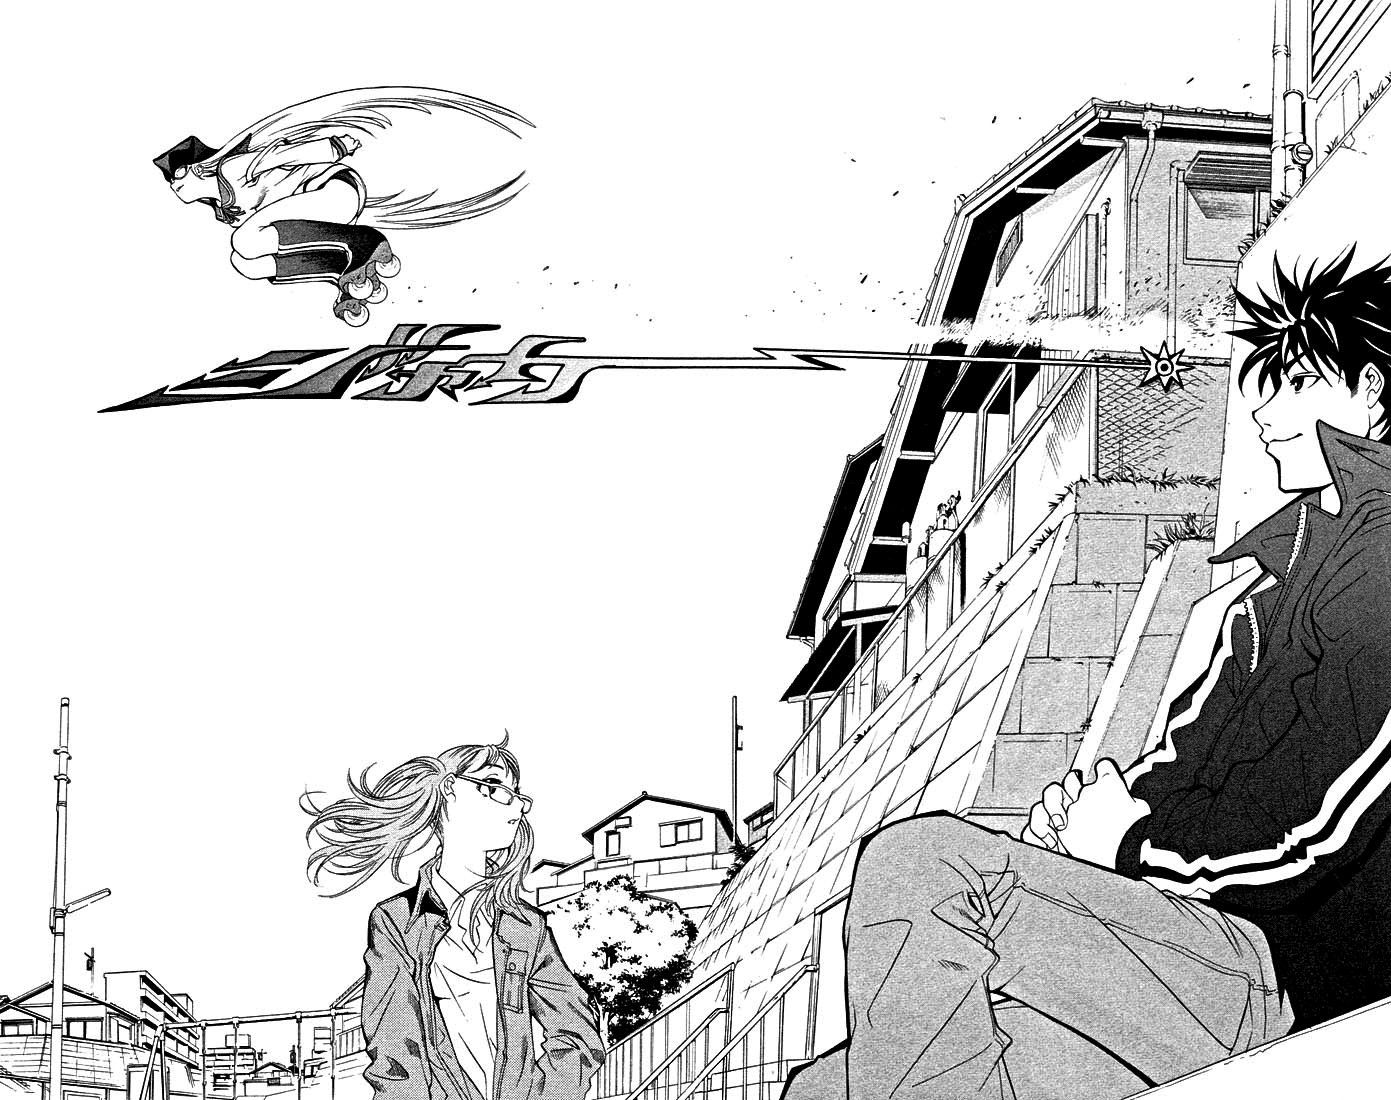 Air Gear, Simca, Itsuki Minami, Noyamano Ringo AWWW OMG I